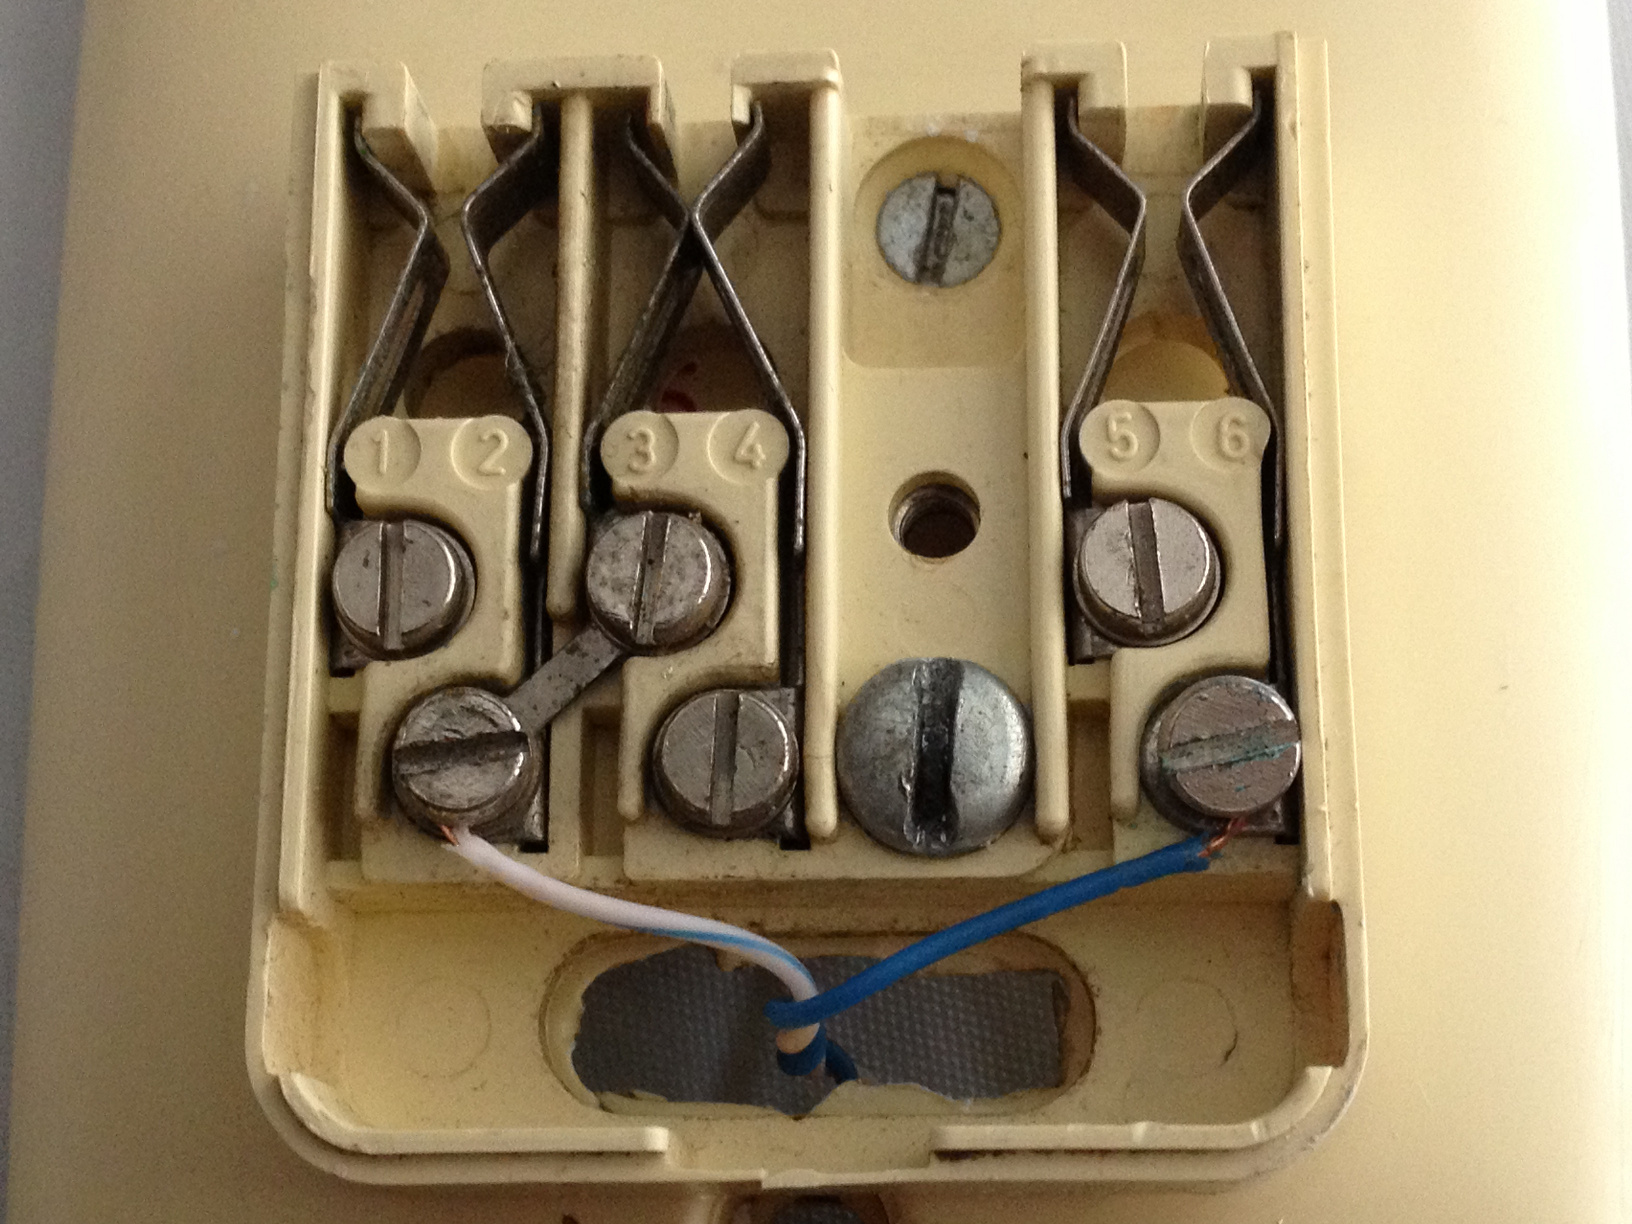 Outstanding telephone jack rj11 jack wiring diagram festooning telephone jack wiring diagram australia sequence diagrams in uml swarovskicordoba Choice Image